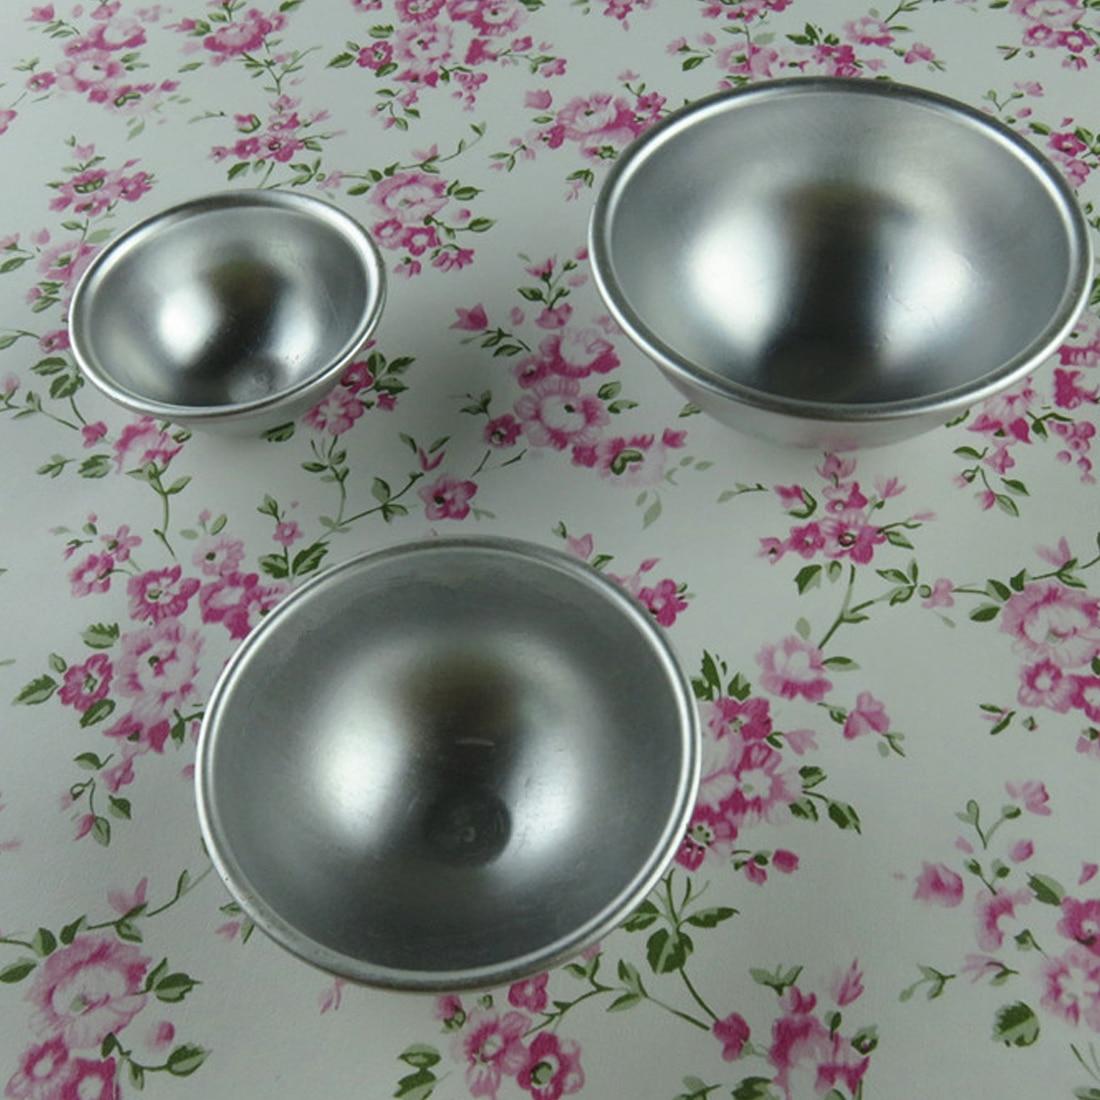 3D Sphere Shape DIY Spa Tool Accessories 1PC 5.5*2.5cm Mini Aluminum Alloy Shallow Semicircle Bath Bomb Salt Ball Metal Mold